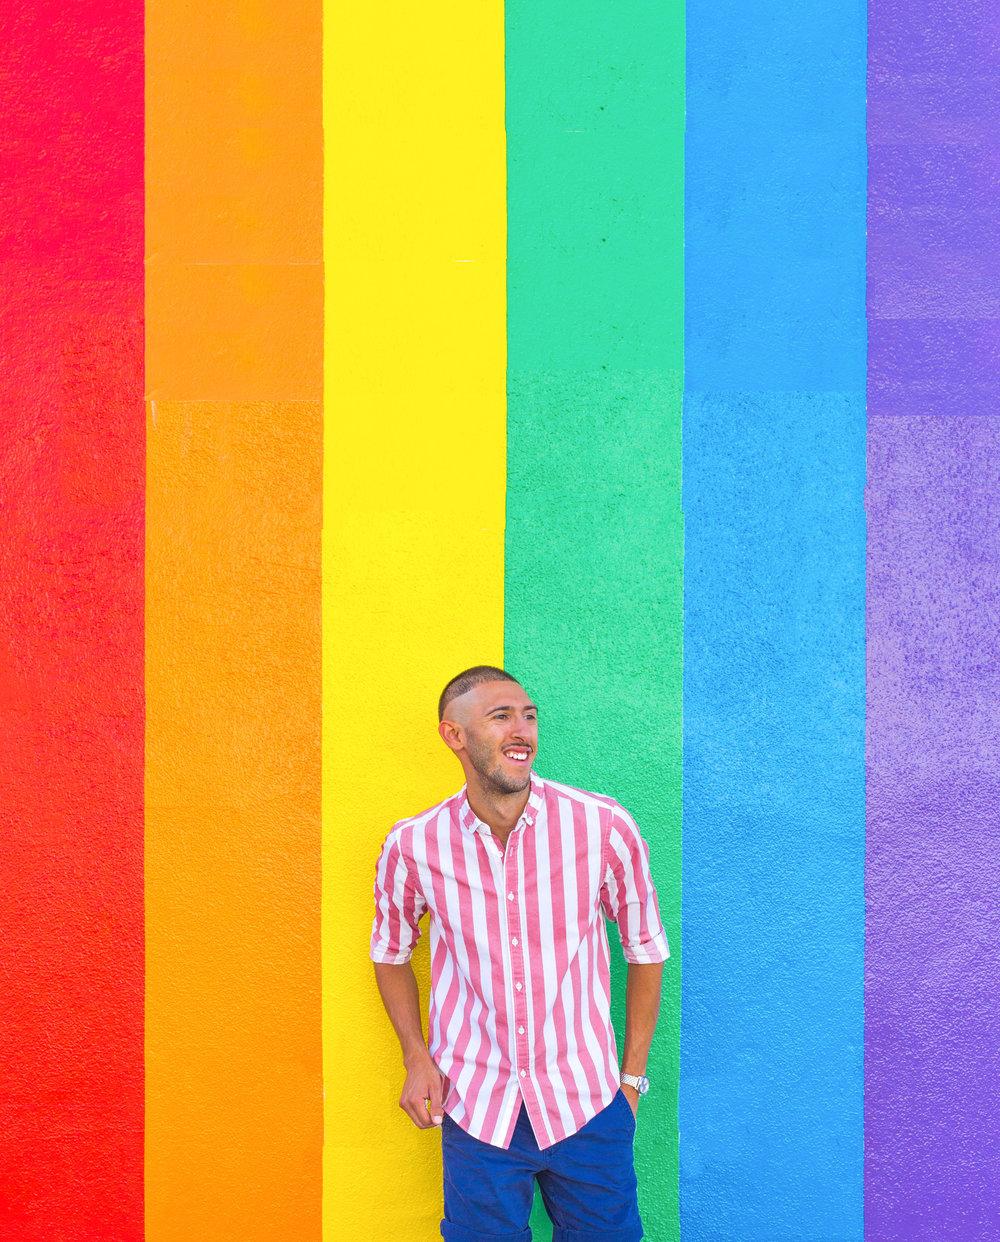 freddy-rodriguez-celebrate-pride-wall-nyc.jpg